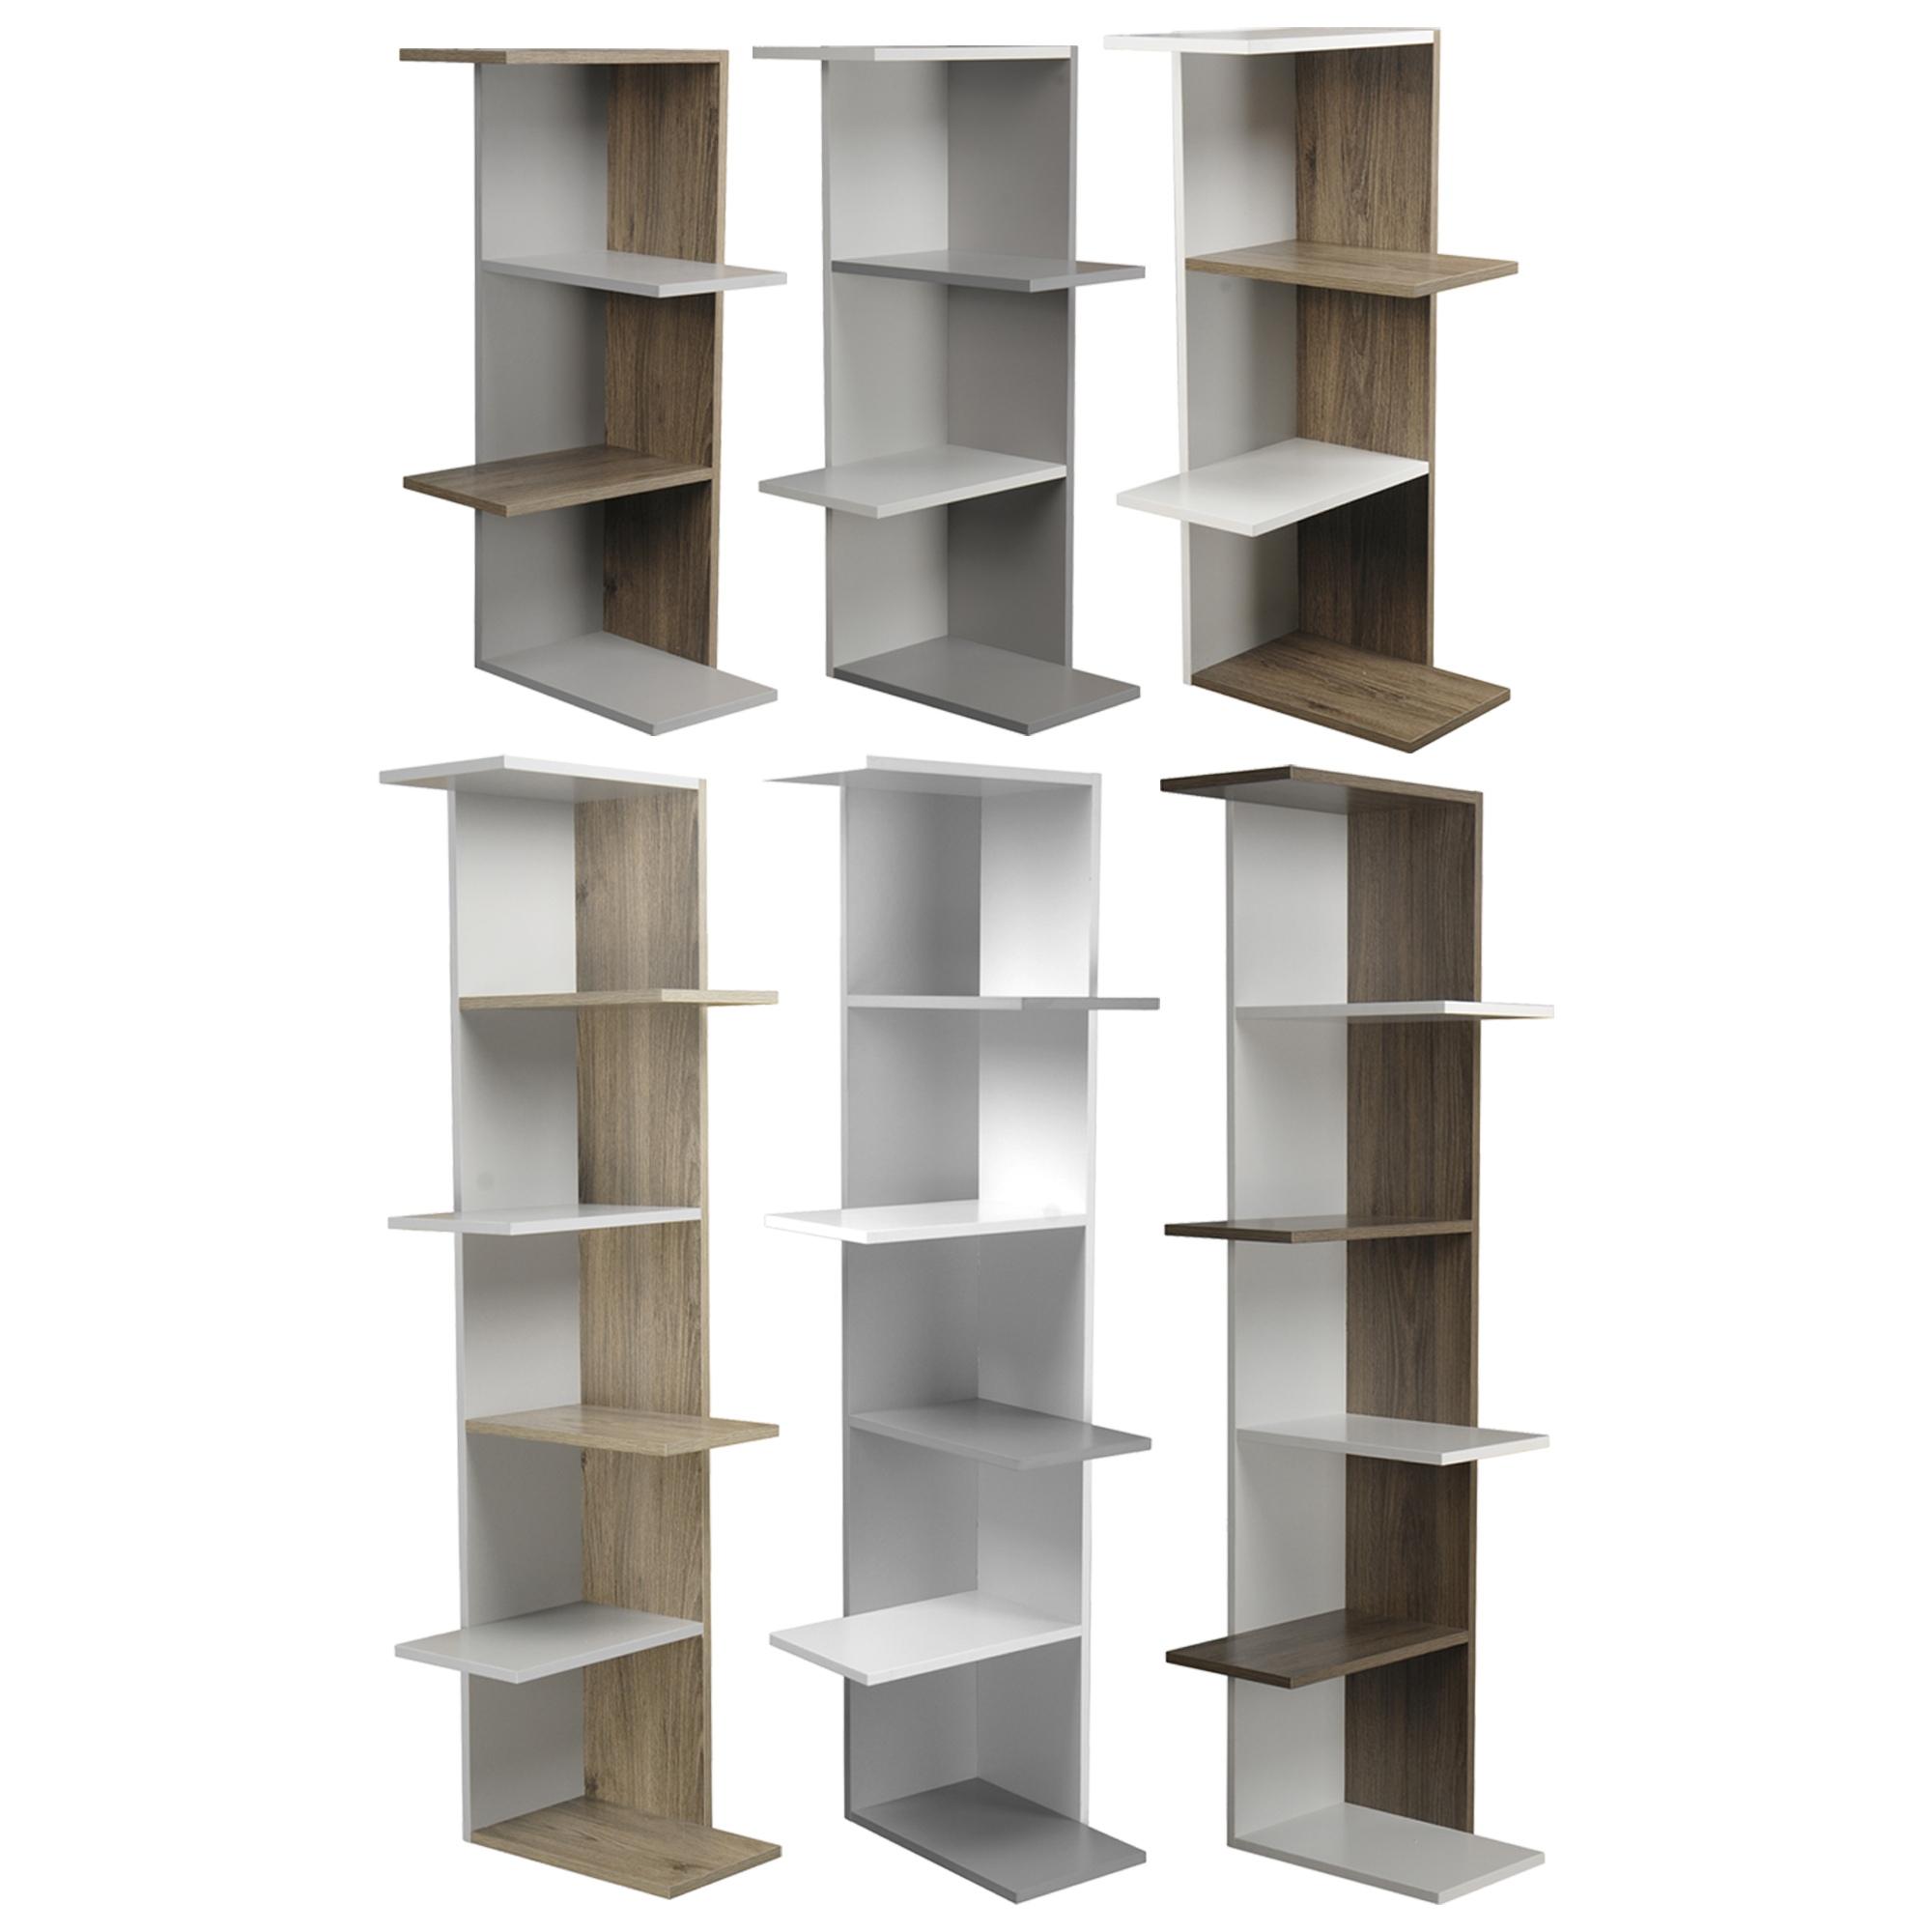 Details about Wooden Modern Corner Bookcase Shelves Living Room Storage  Free Standing Display